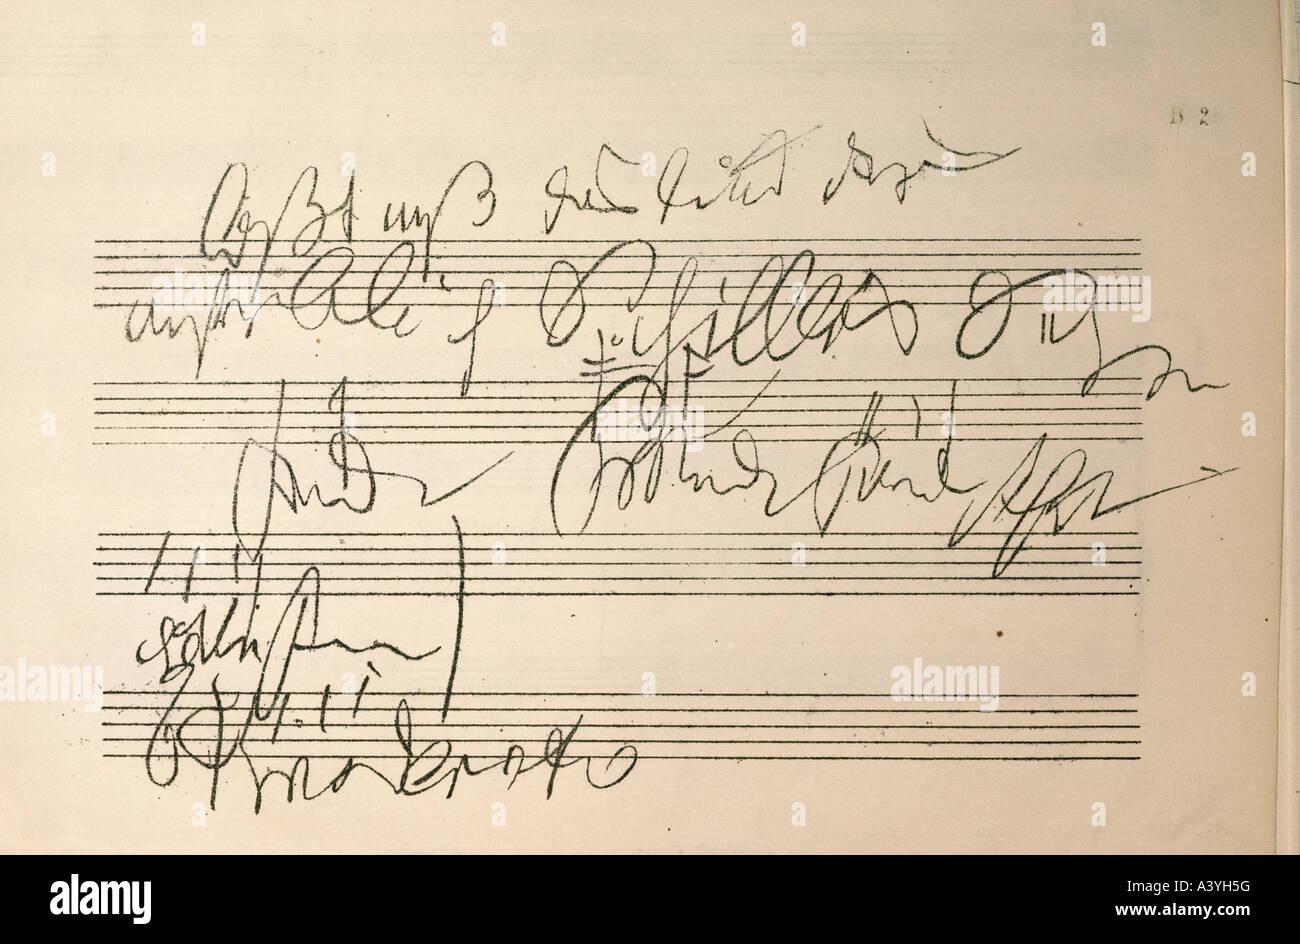 'Beethoven, Ludwig van, 17.12.1770 - 26.3.1827, German composer, manuscript, sketch, score of 9th symphony, - Stock Image